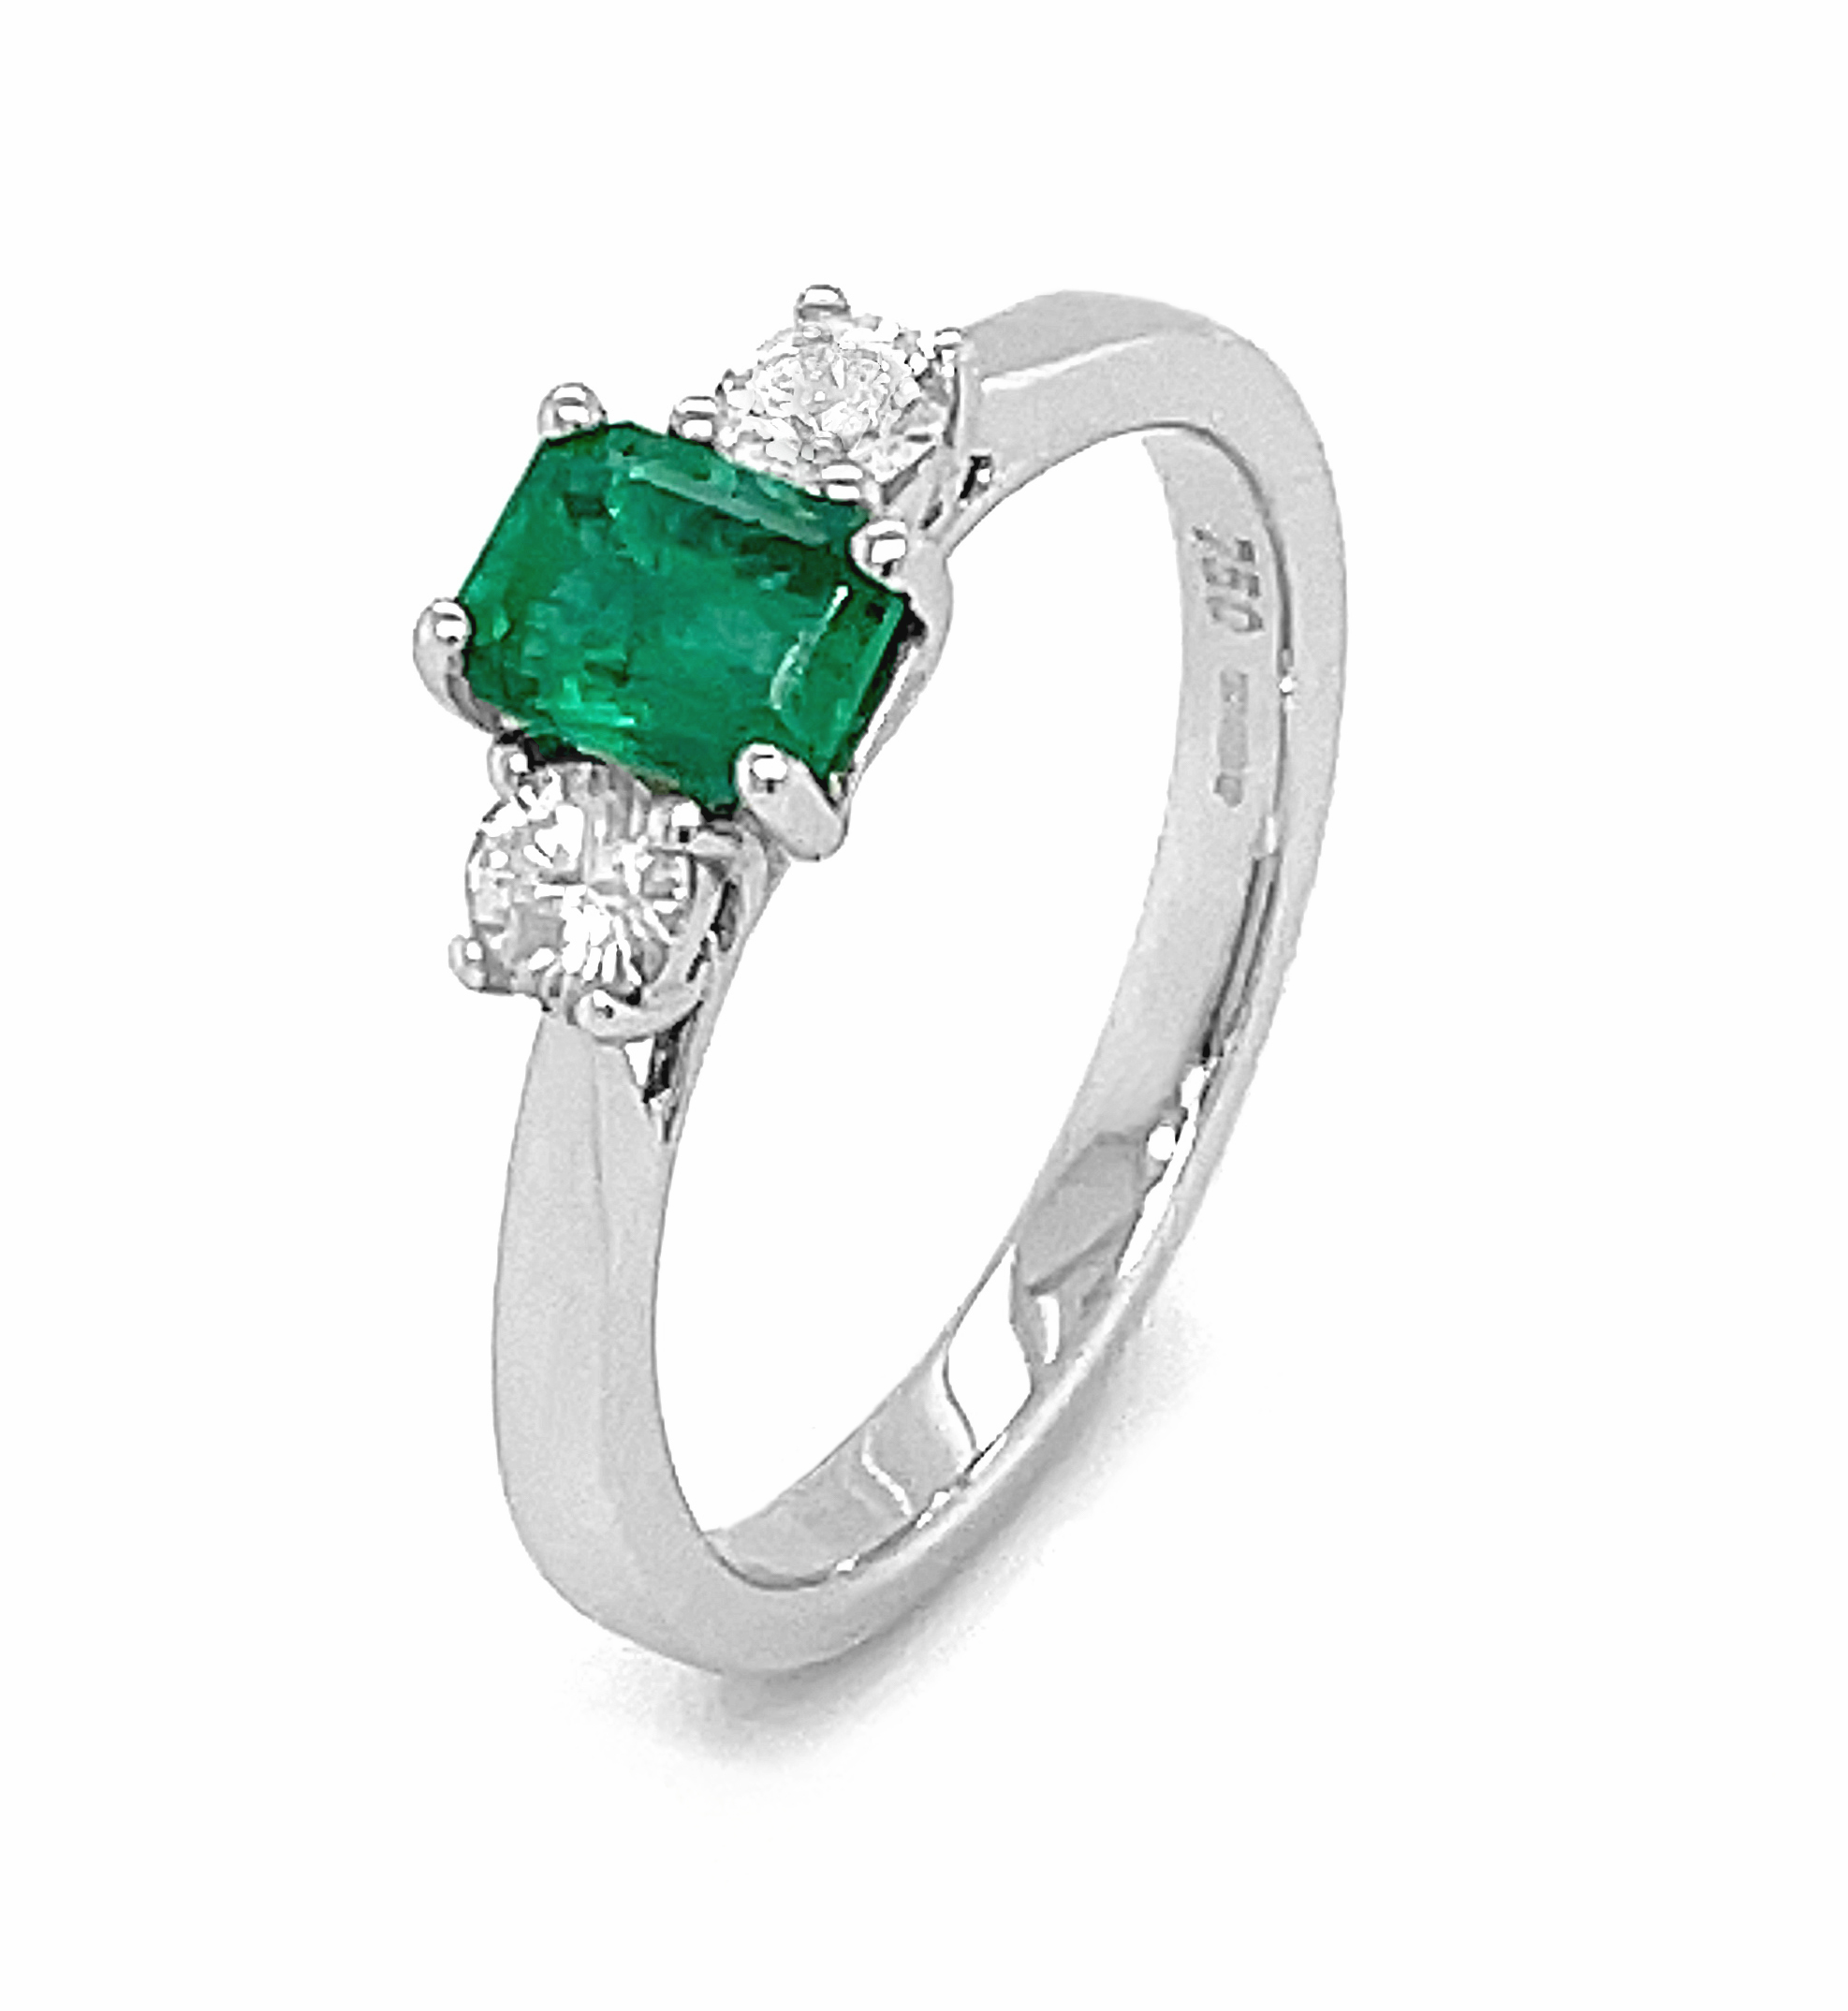 3 Stone, Octagonal Emerald Engagement Ring